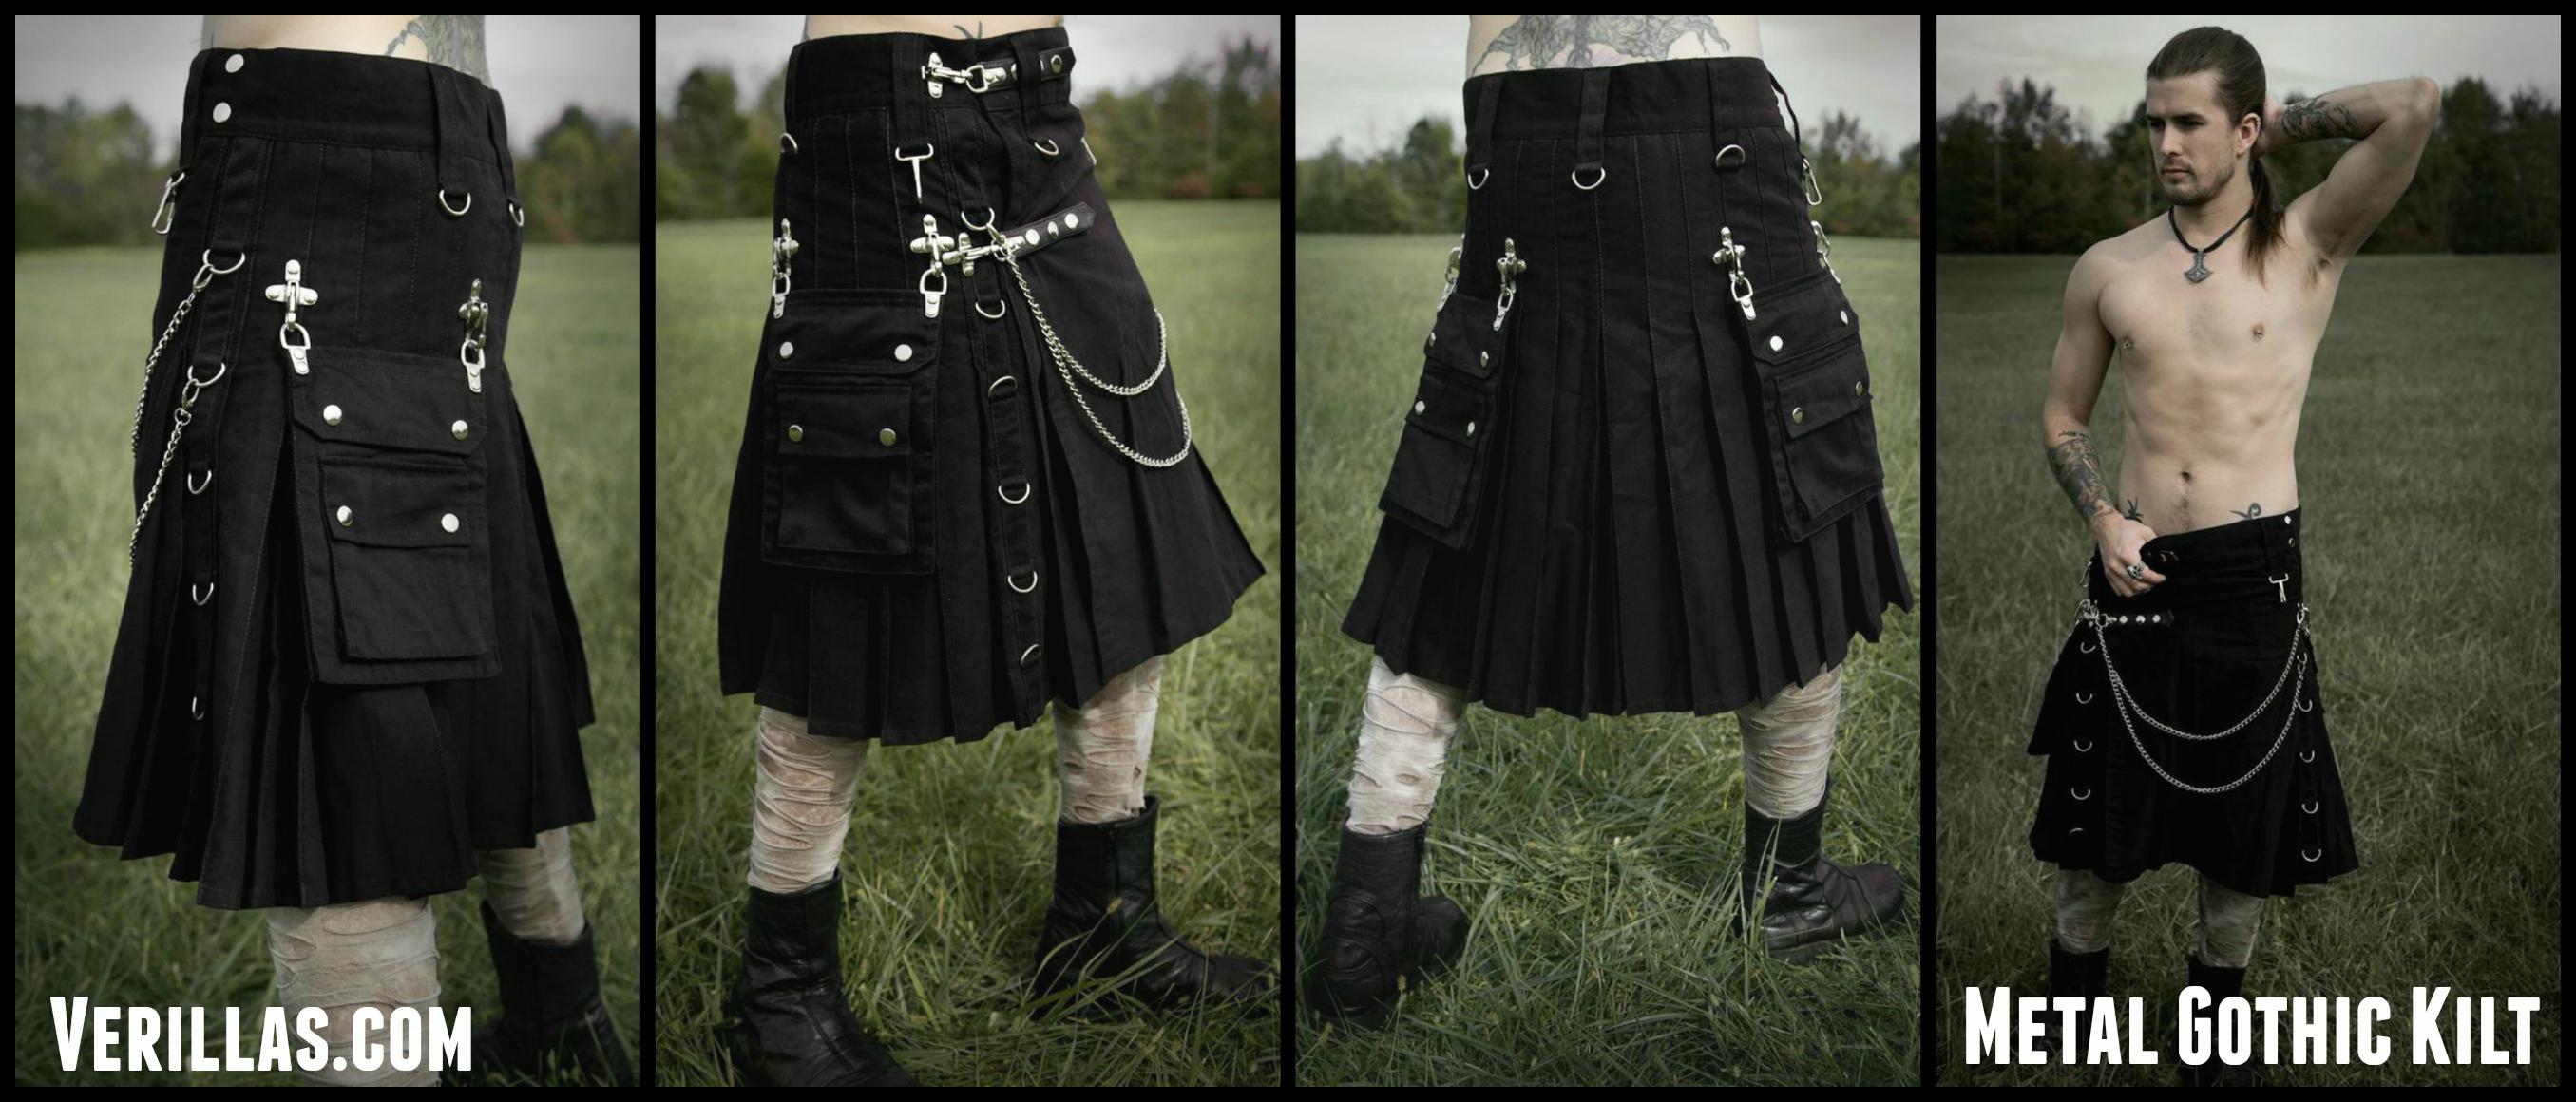 Black steampunk boots